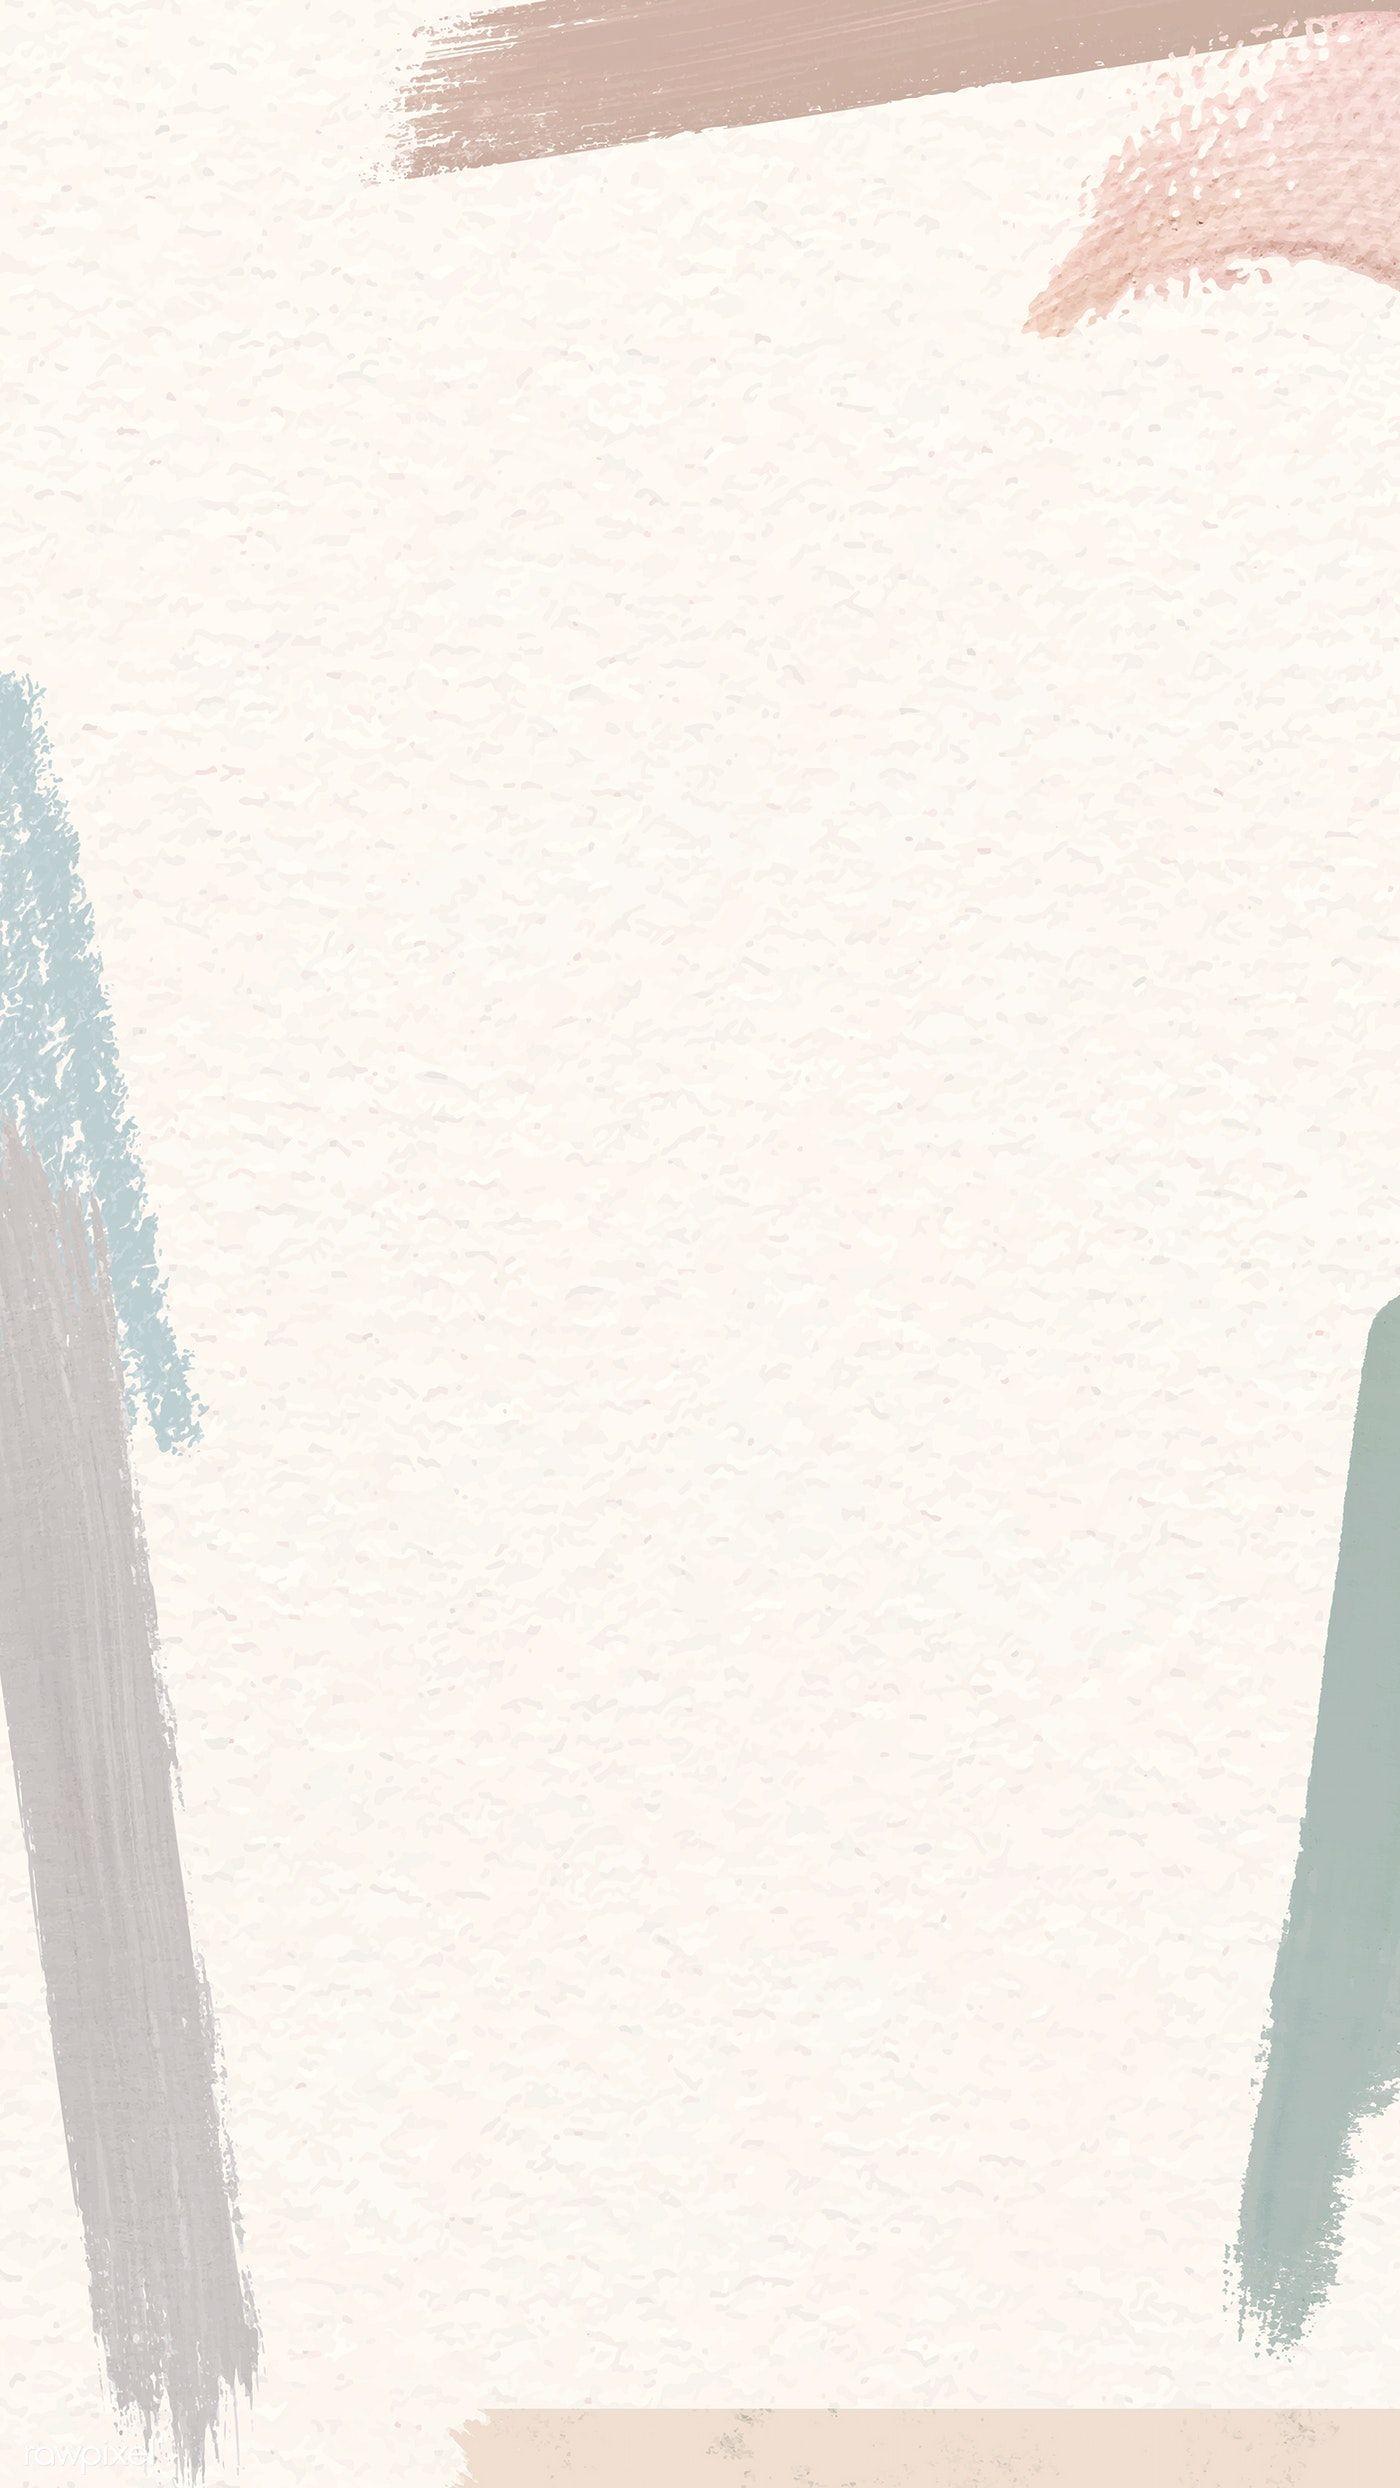 Download premium vector of Colorful brushstroke frame on background vector